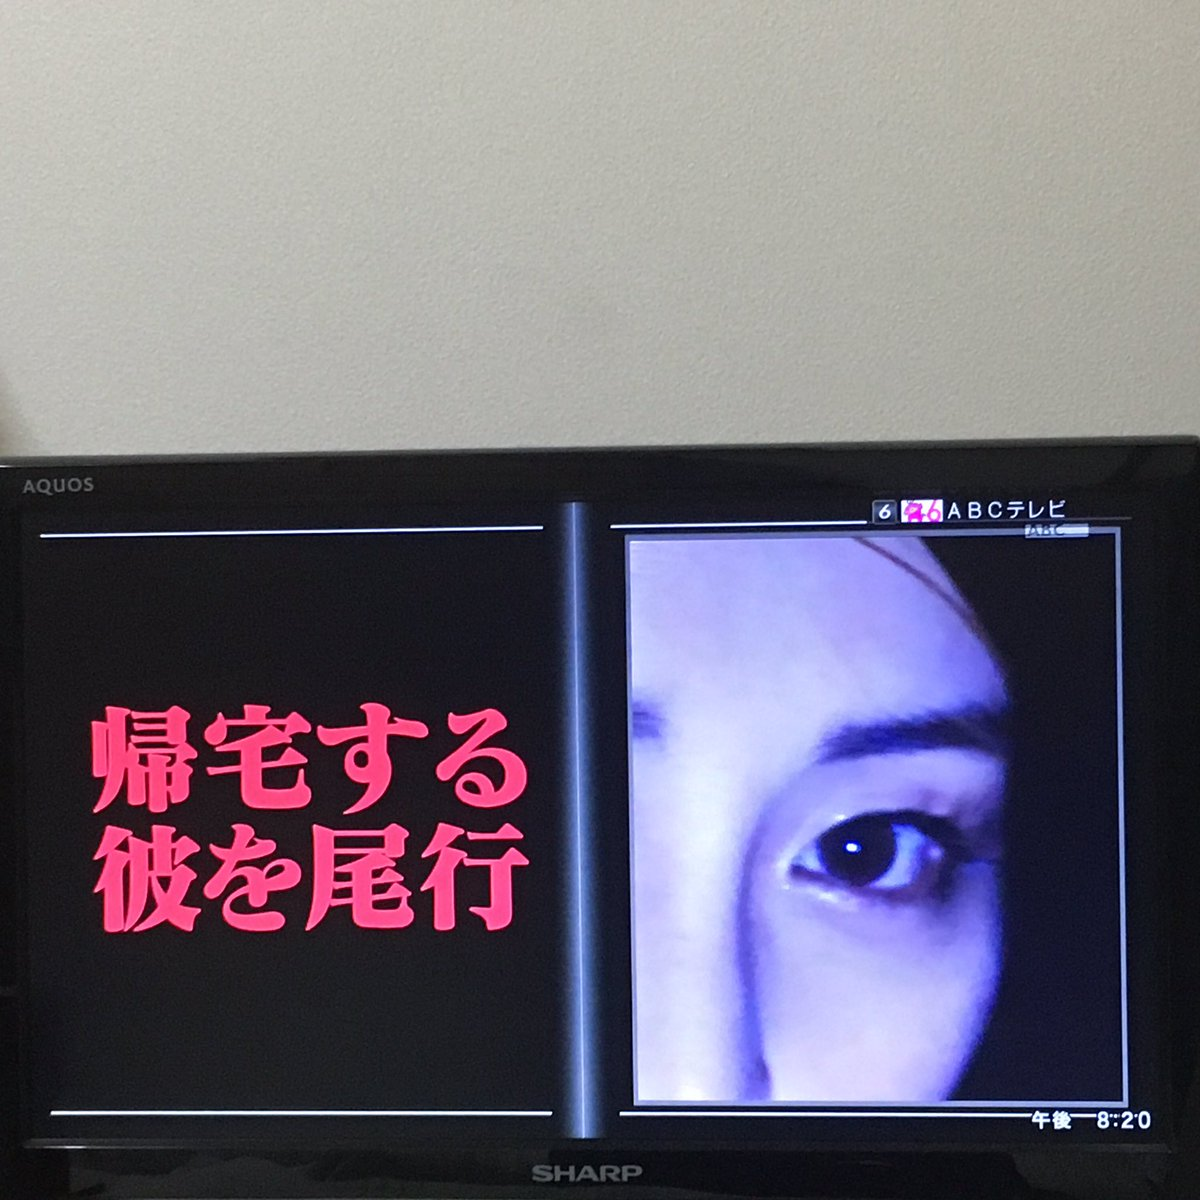 http://pbs.twimg.com/media/CyWHdrwUQAARuli.jpg